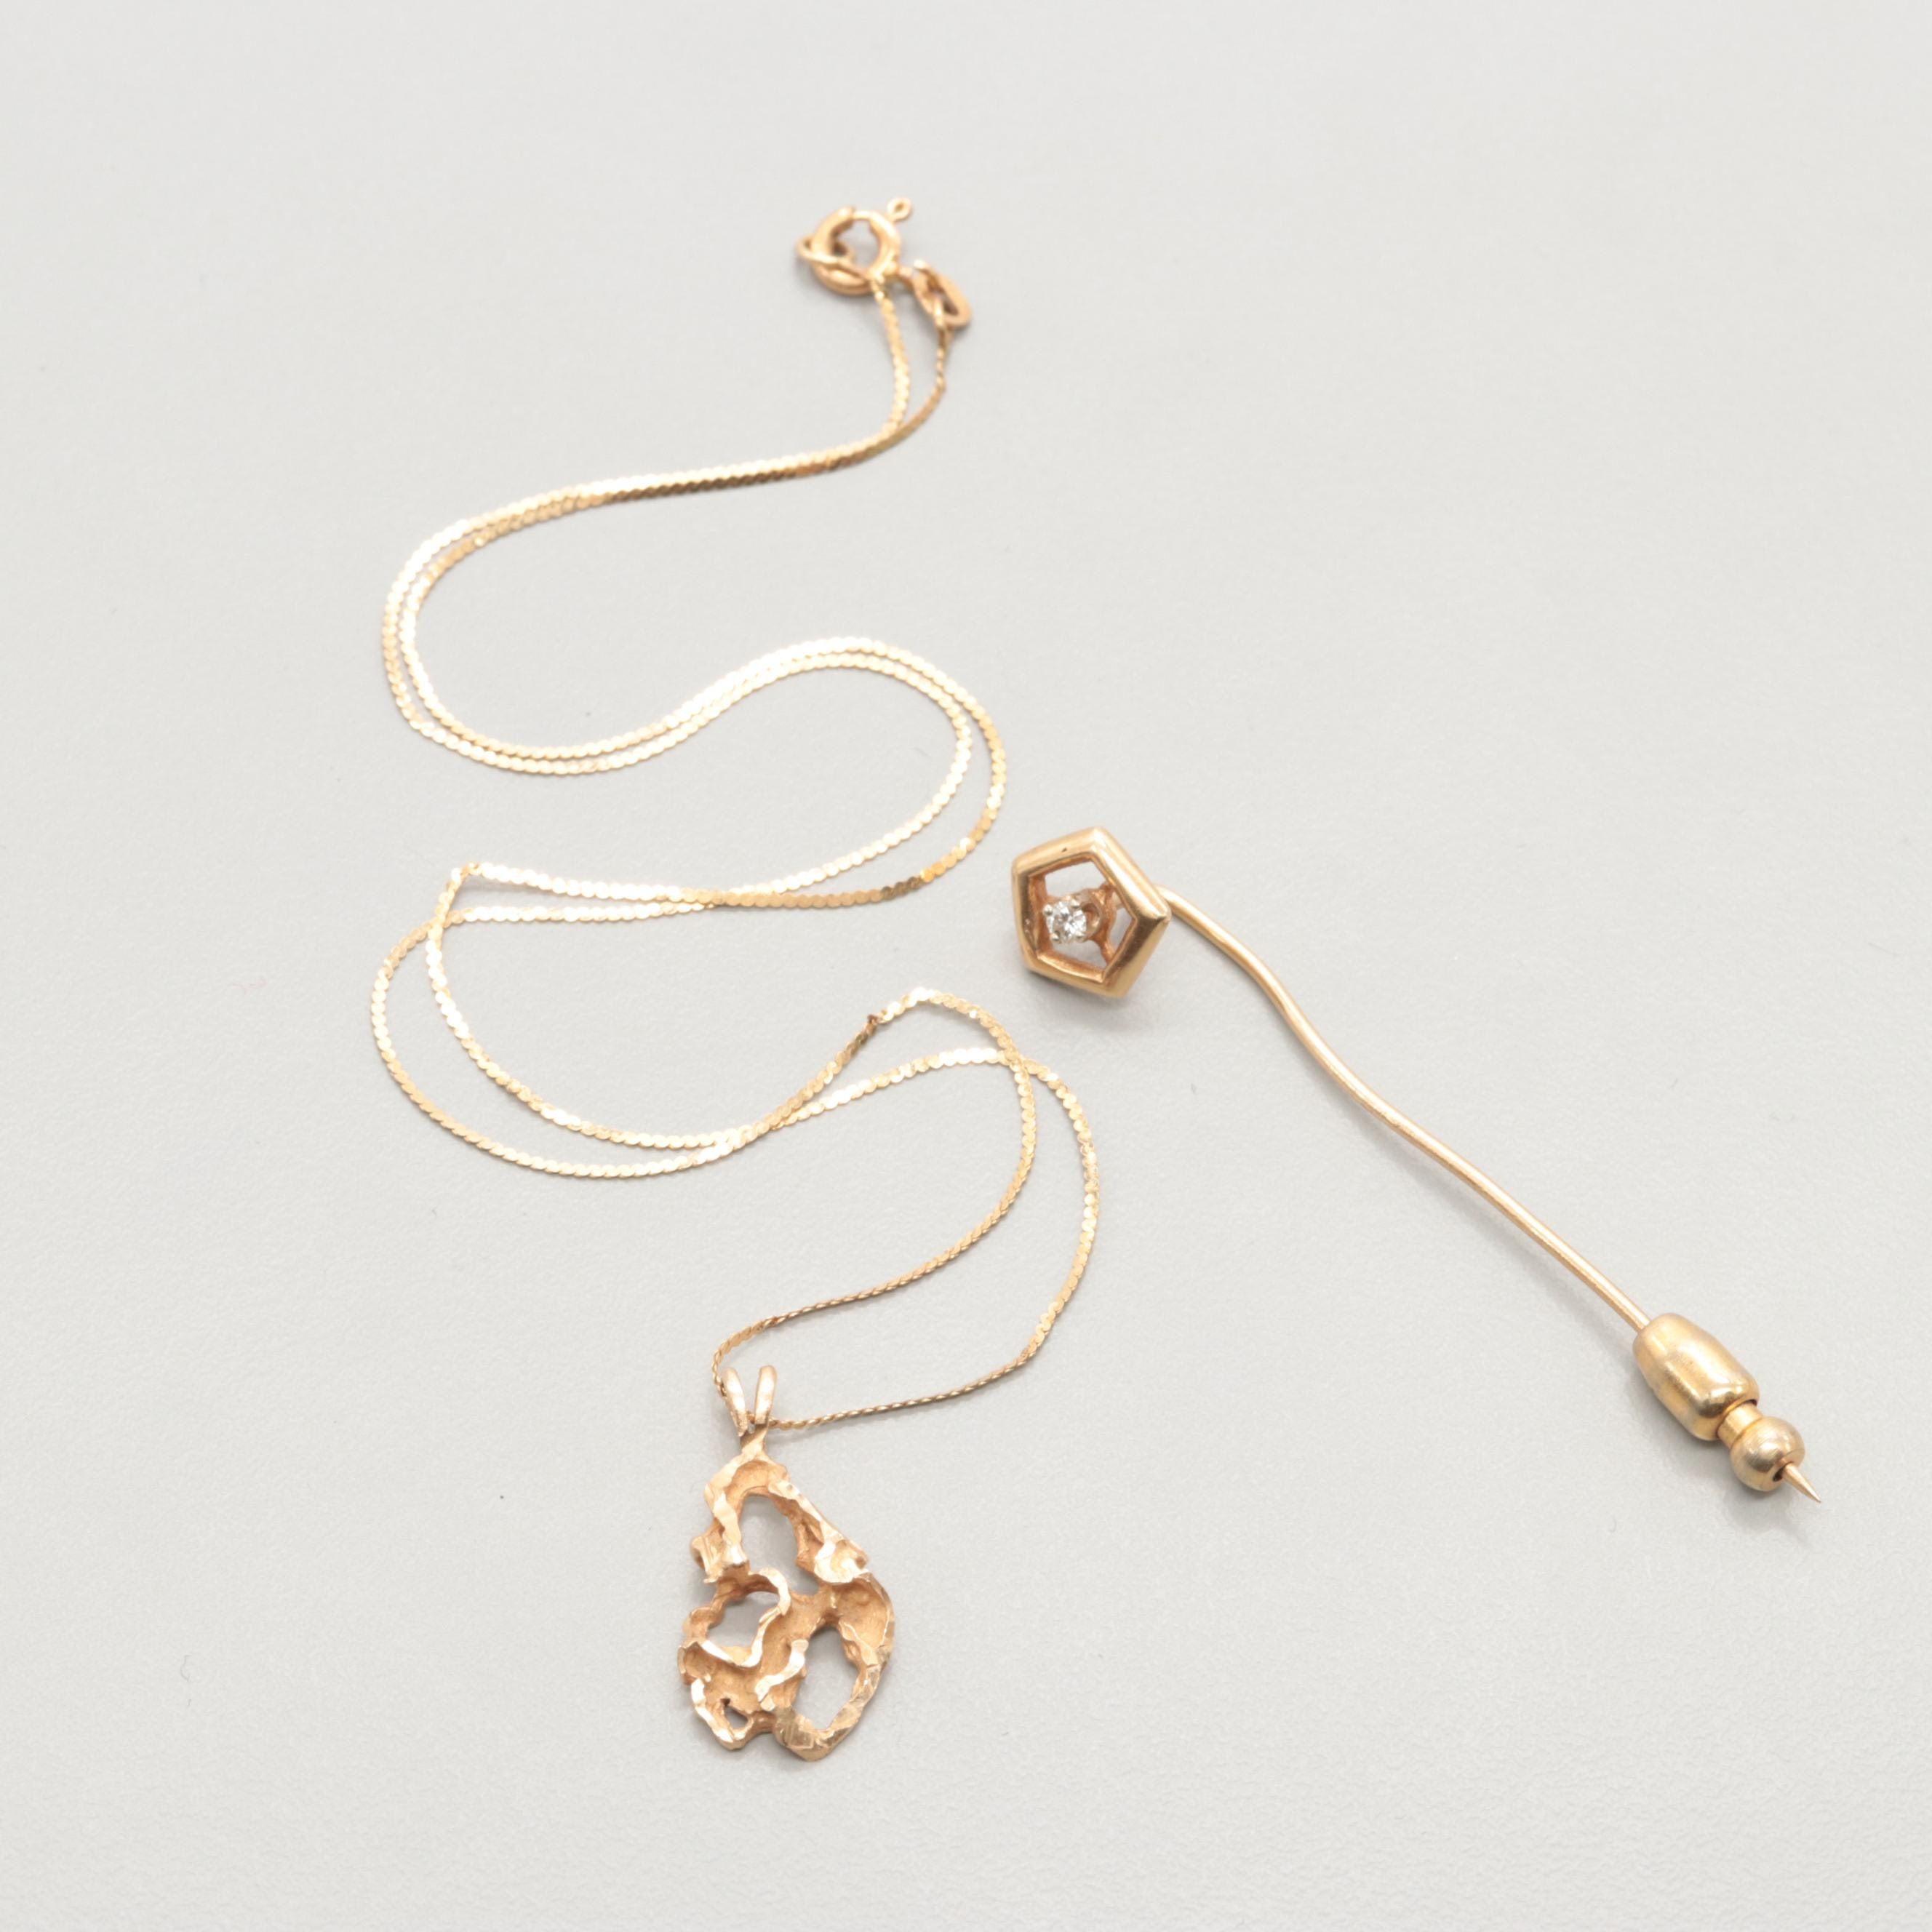 14K Yellow Gold Necklace and Diamond Stick Pin